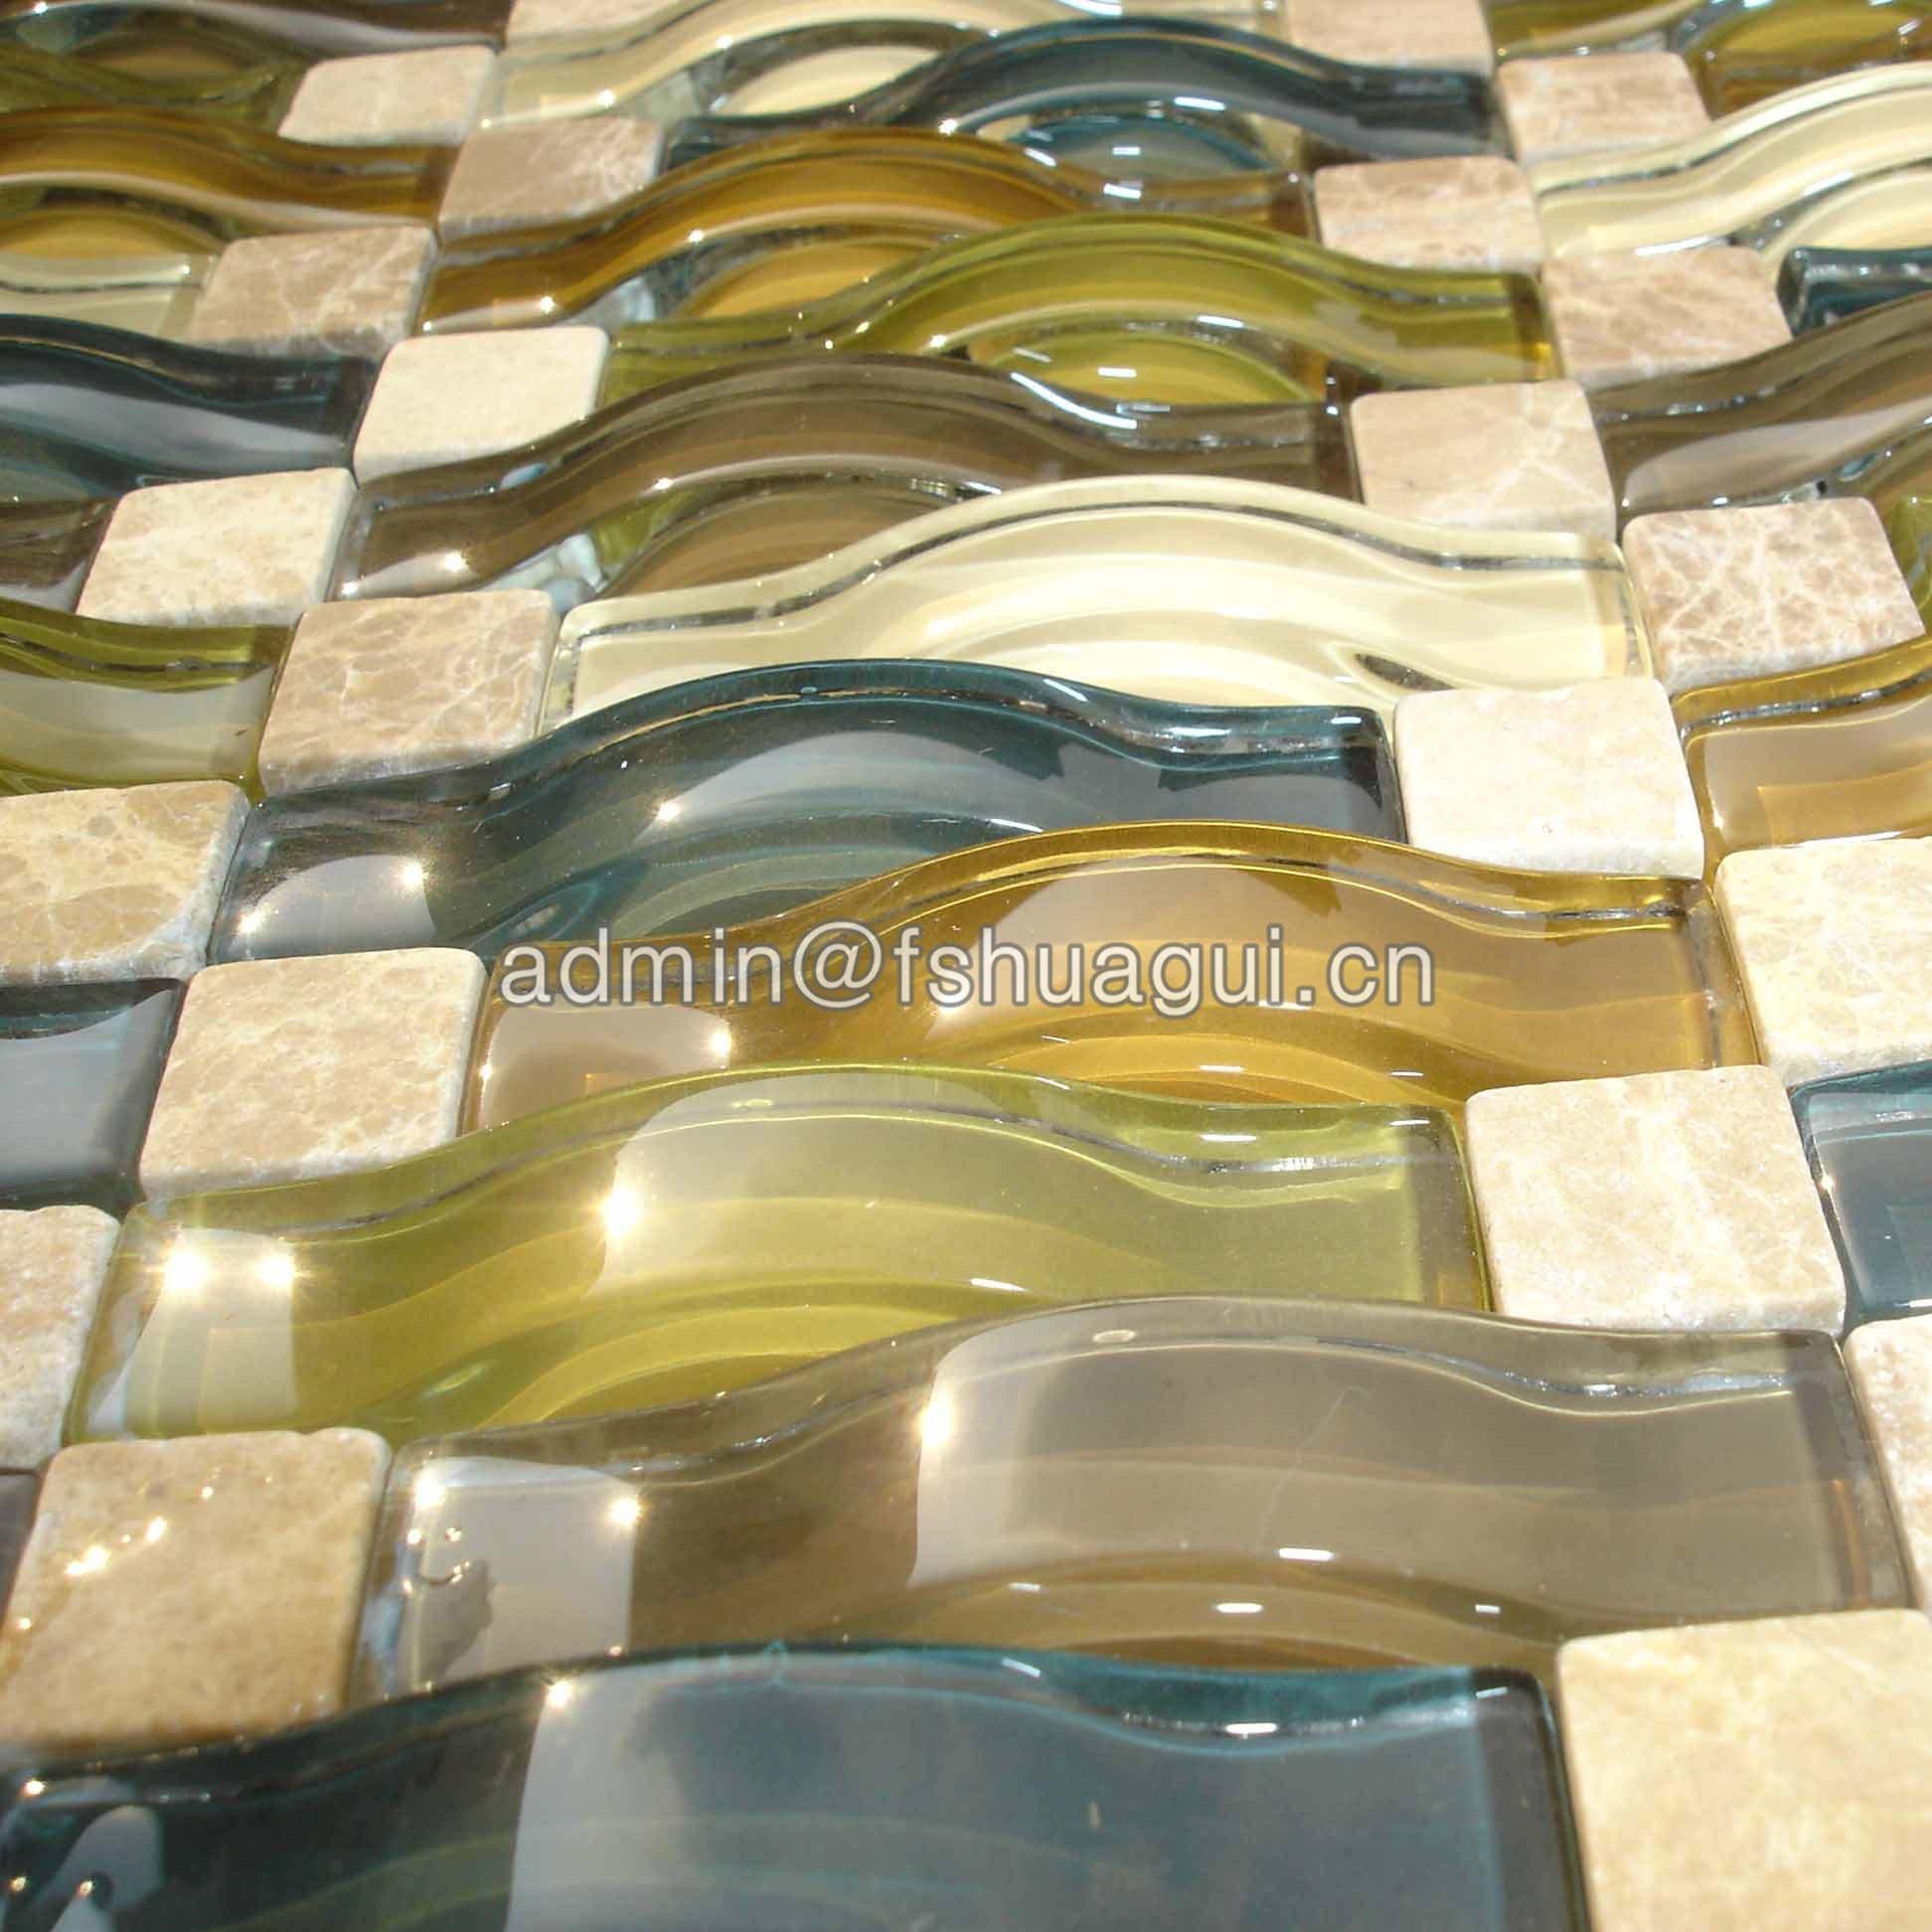 Huagui Glass mosaic tile HG-84007 GLASS MOSAIC TILE image62